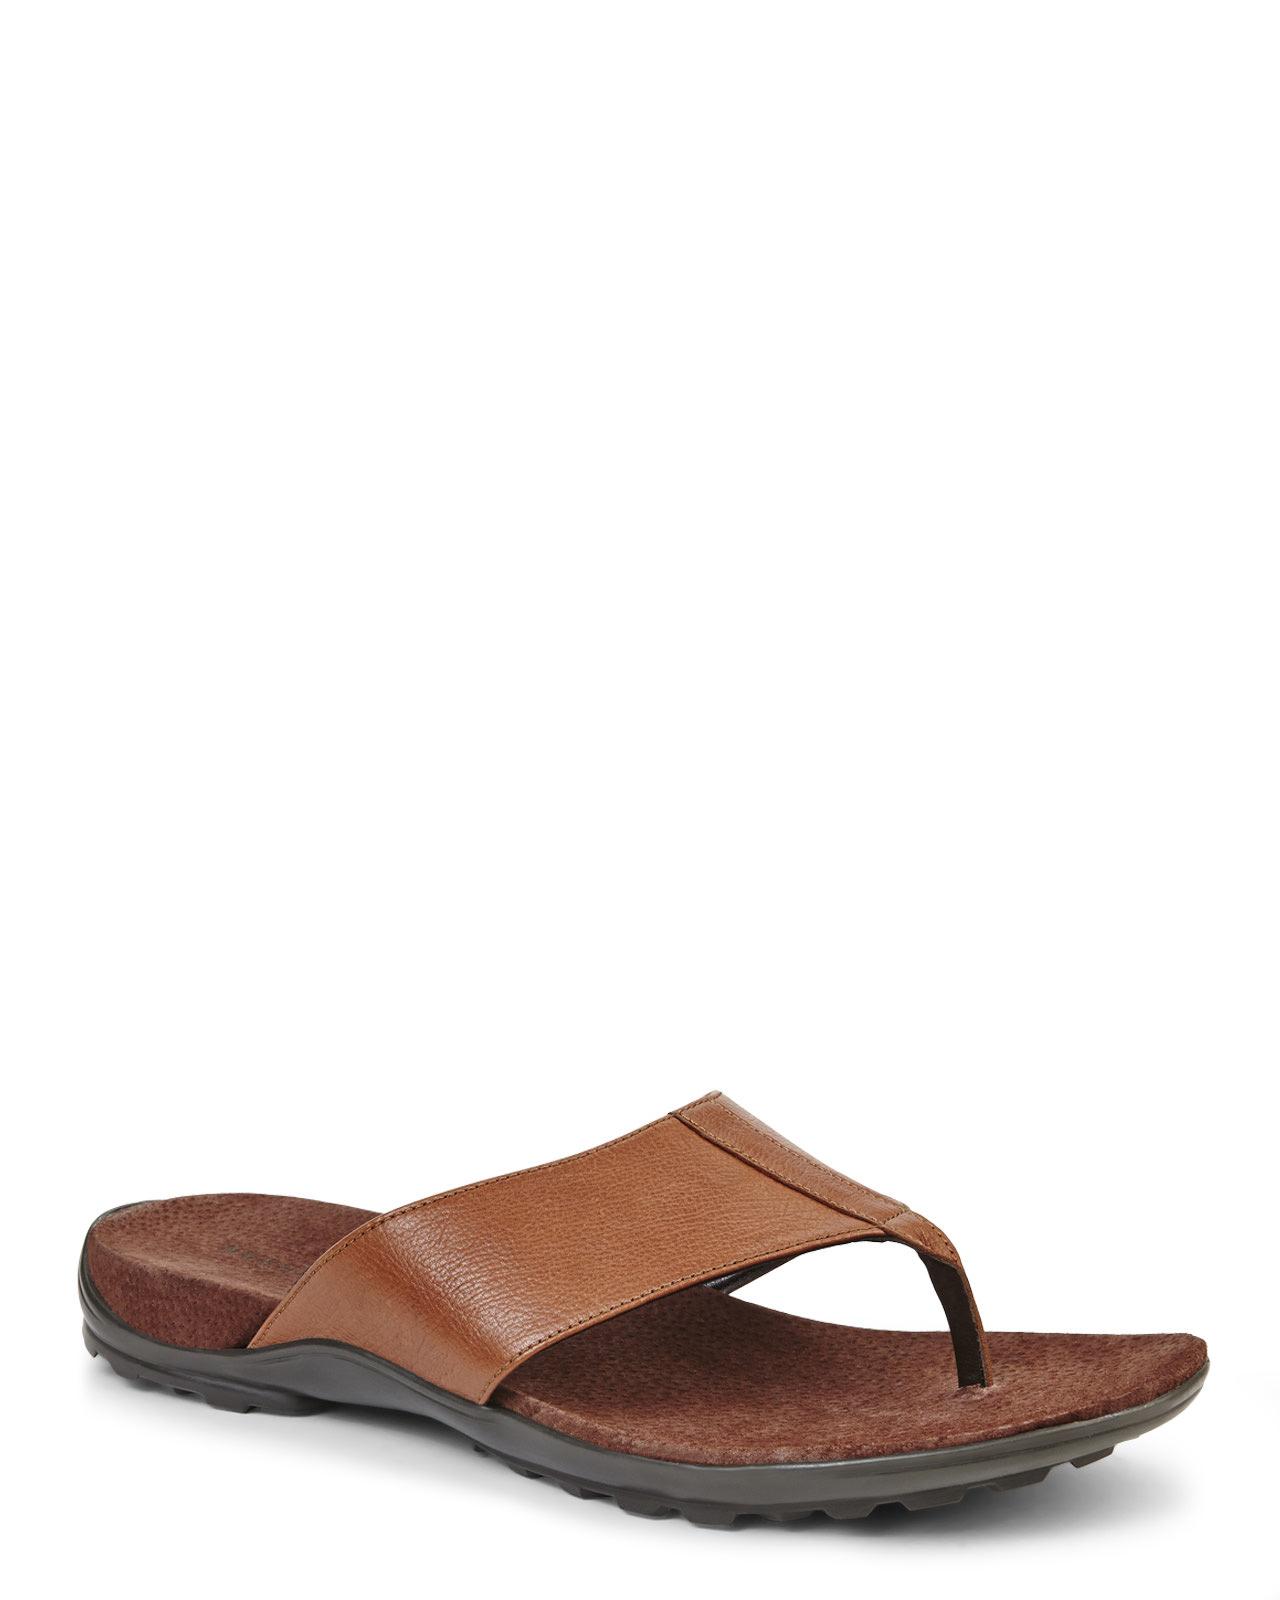 13597693059c Lyst - Cole Haan Chestnut Tucker Thong Sandal in Brown for Men